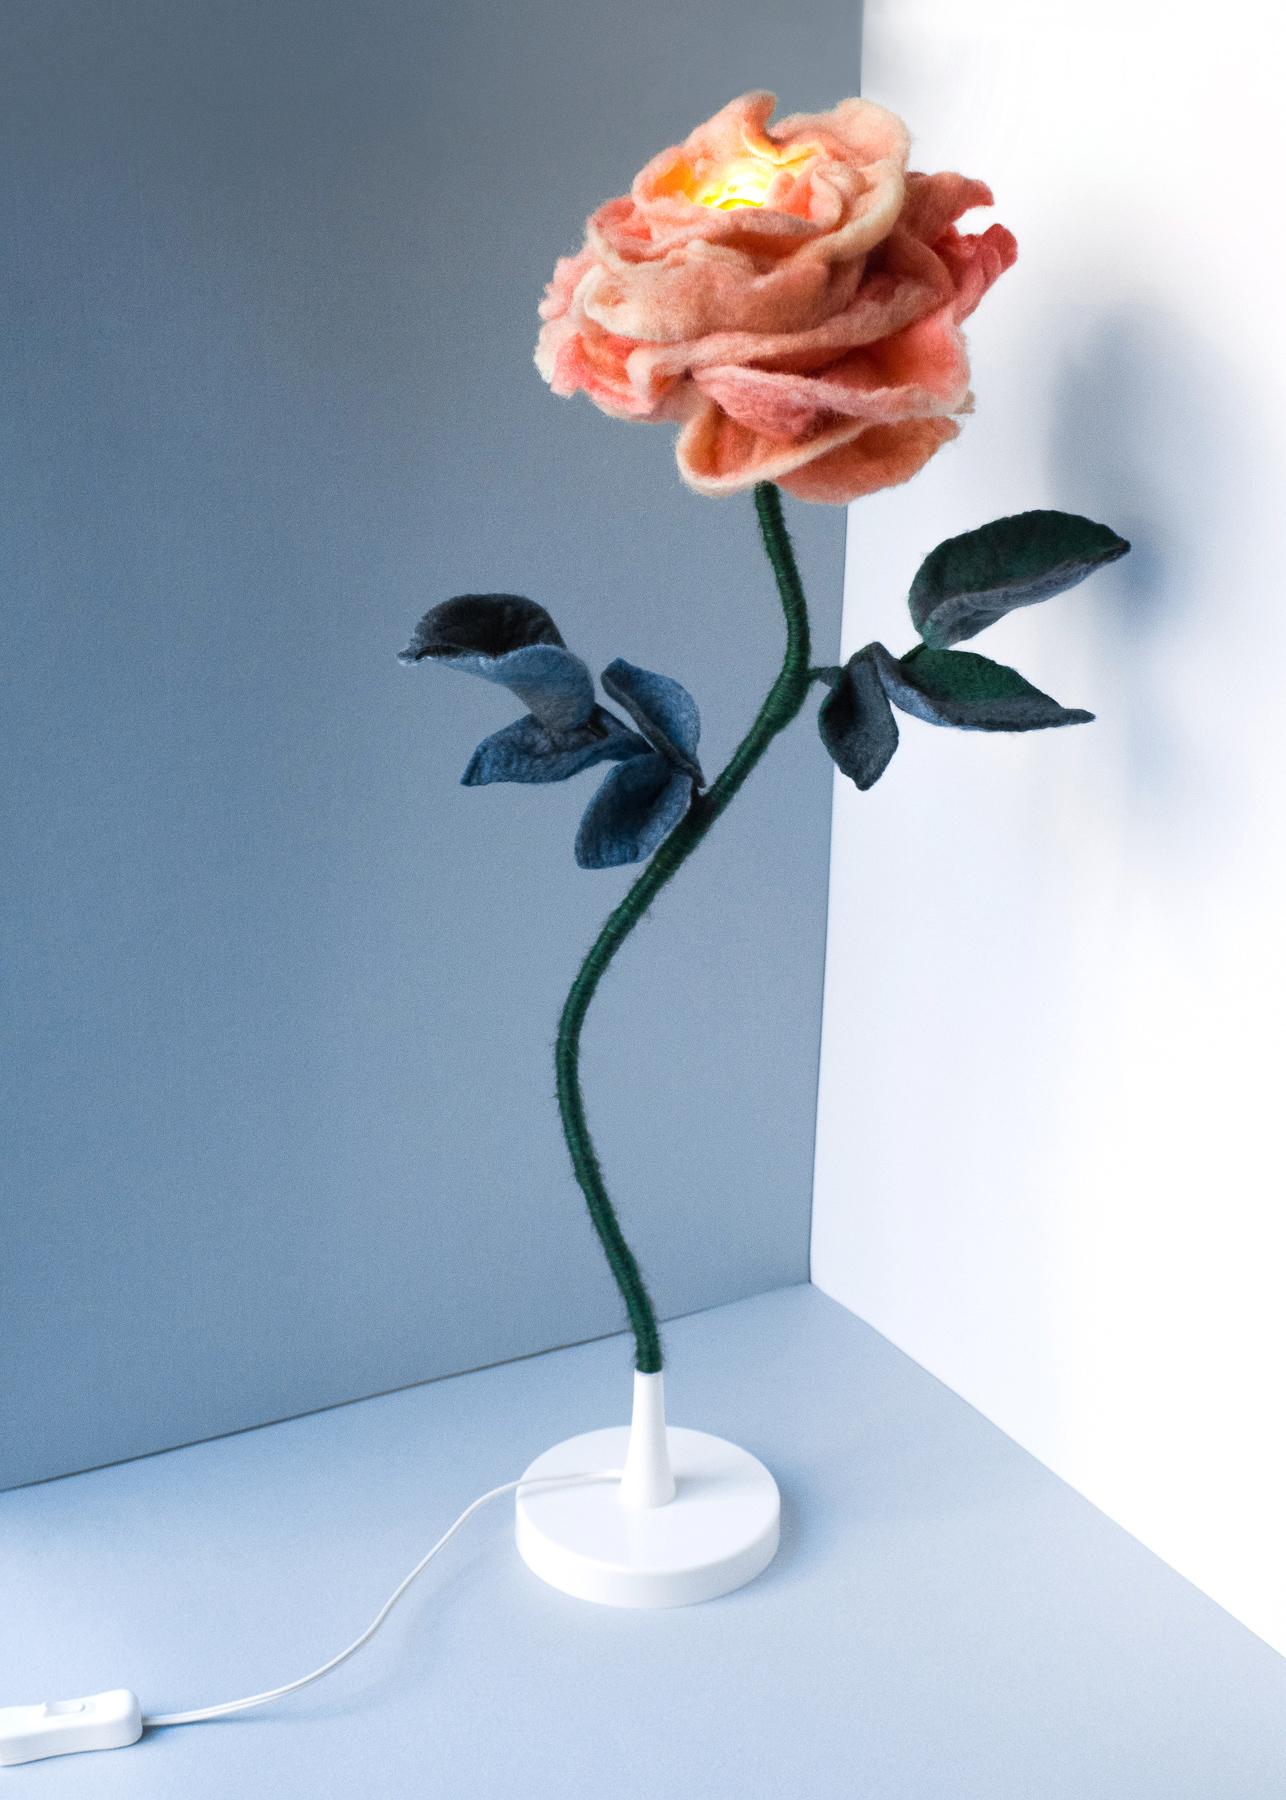 felt-flower-lamp_Peach_Adelya-Tumasyeva_5.jpg